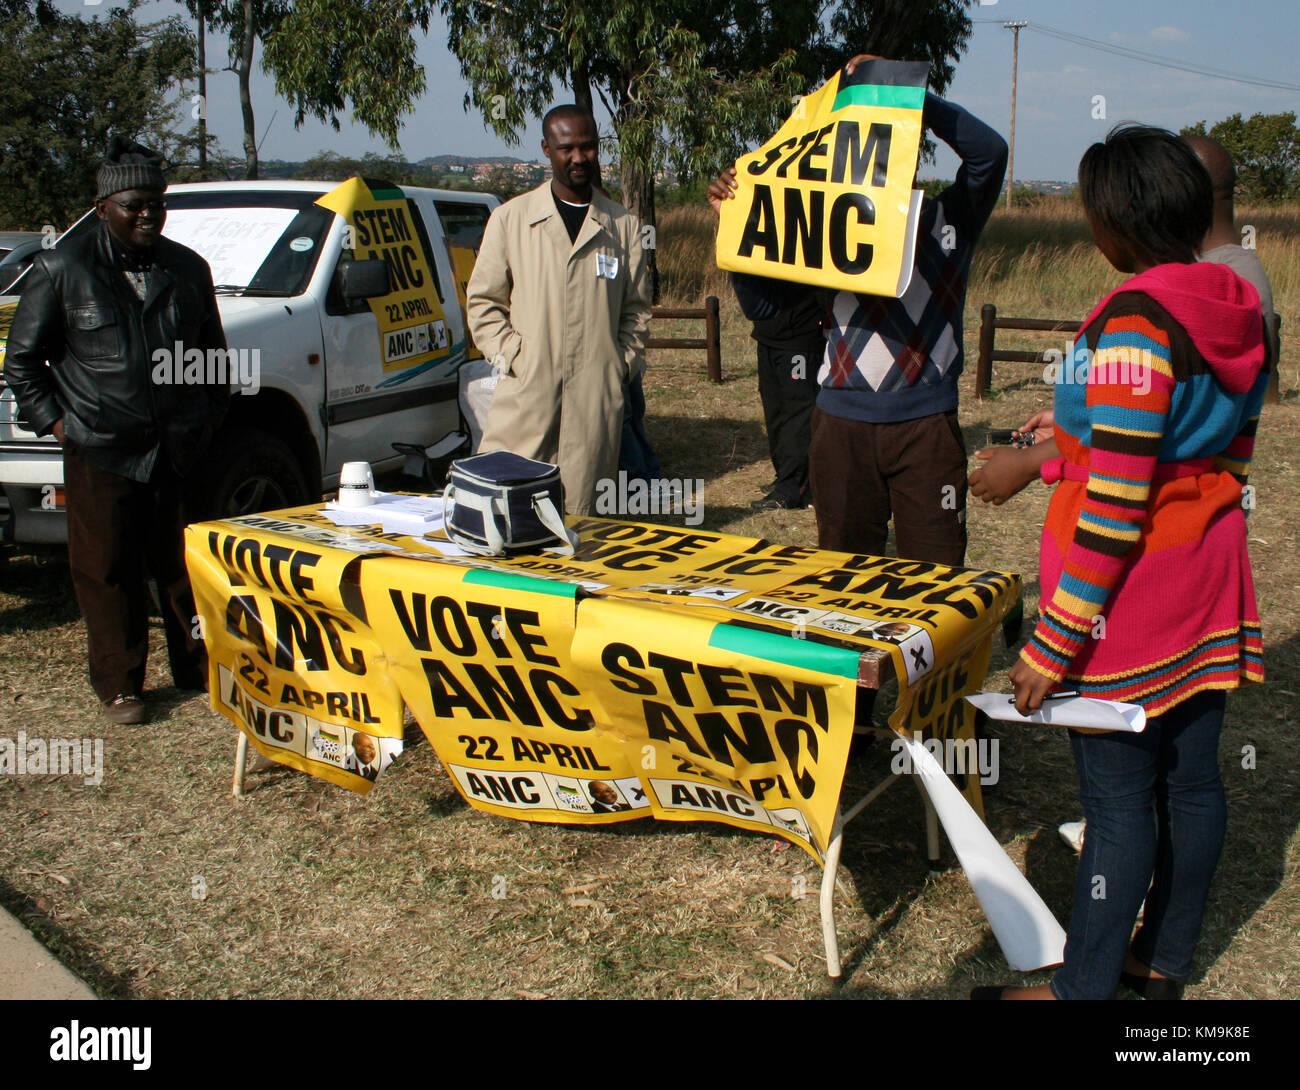 Anc Election Campaign Stock Photos & Anc Election Campaign ...